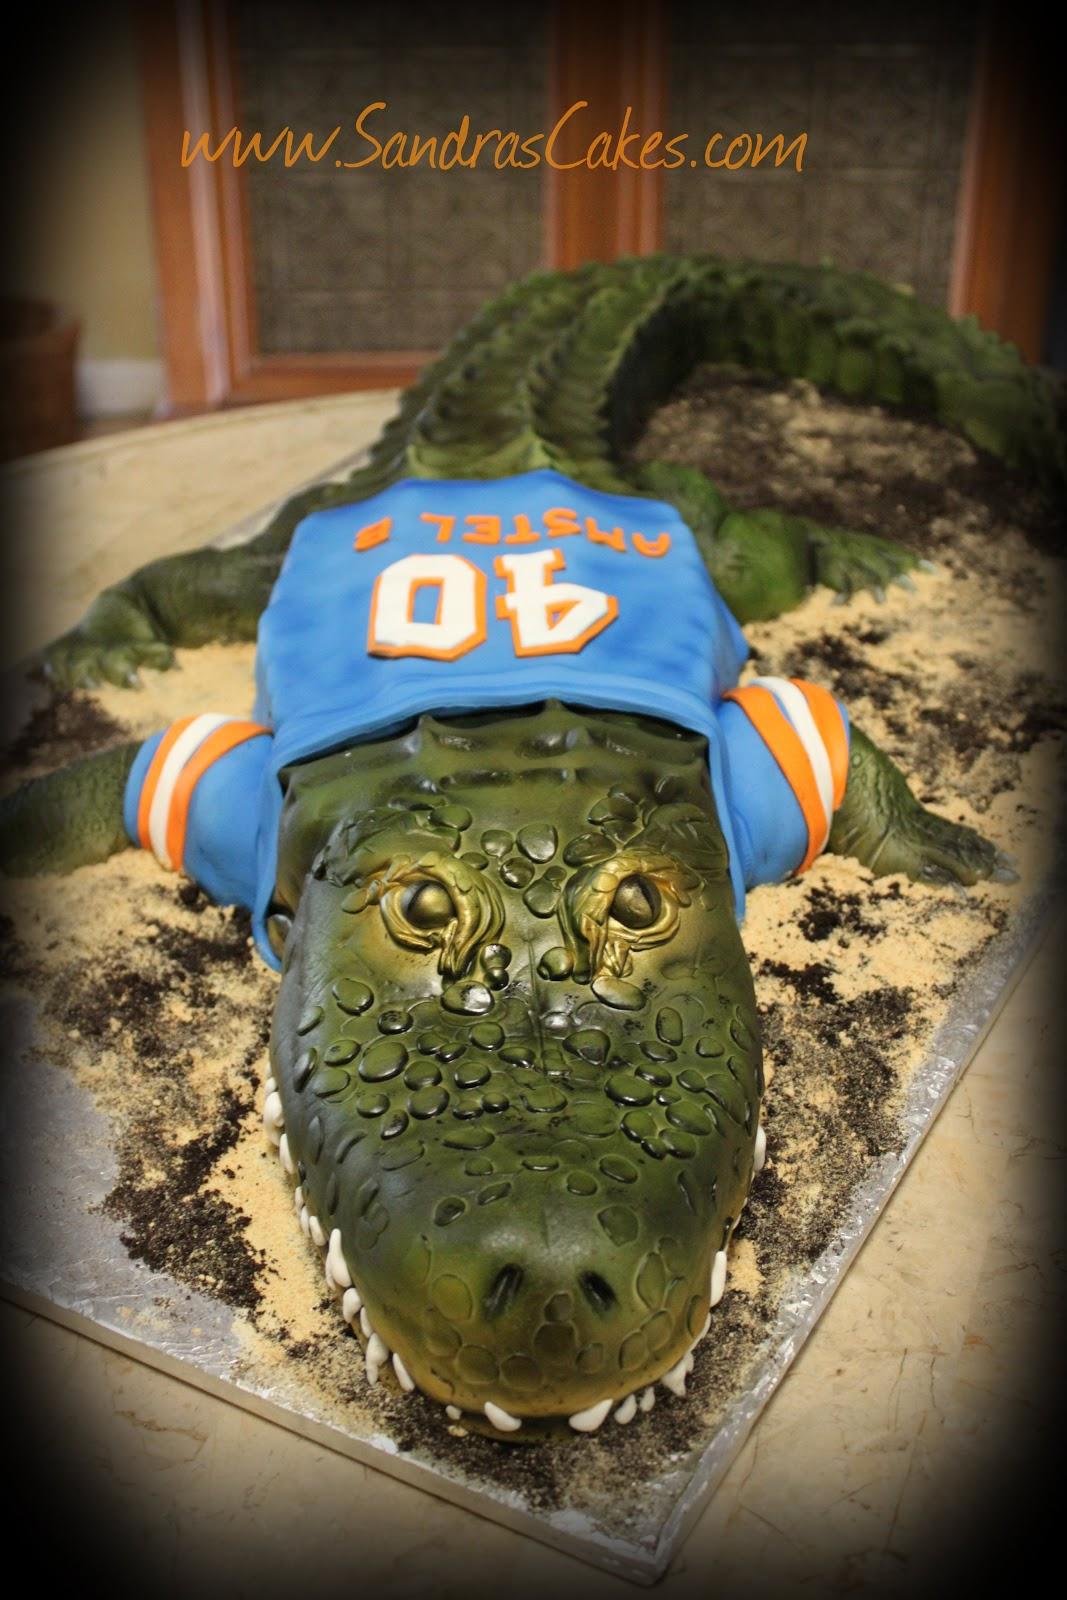 On Birthday Cakes Florida Gators Cake